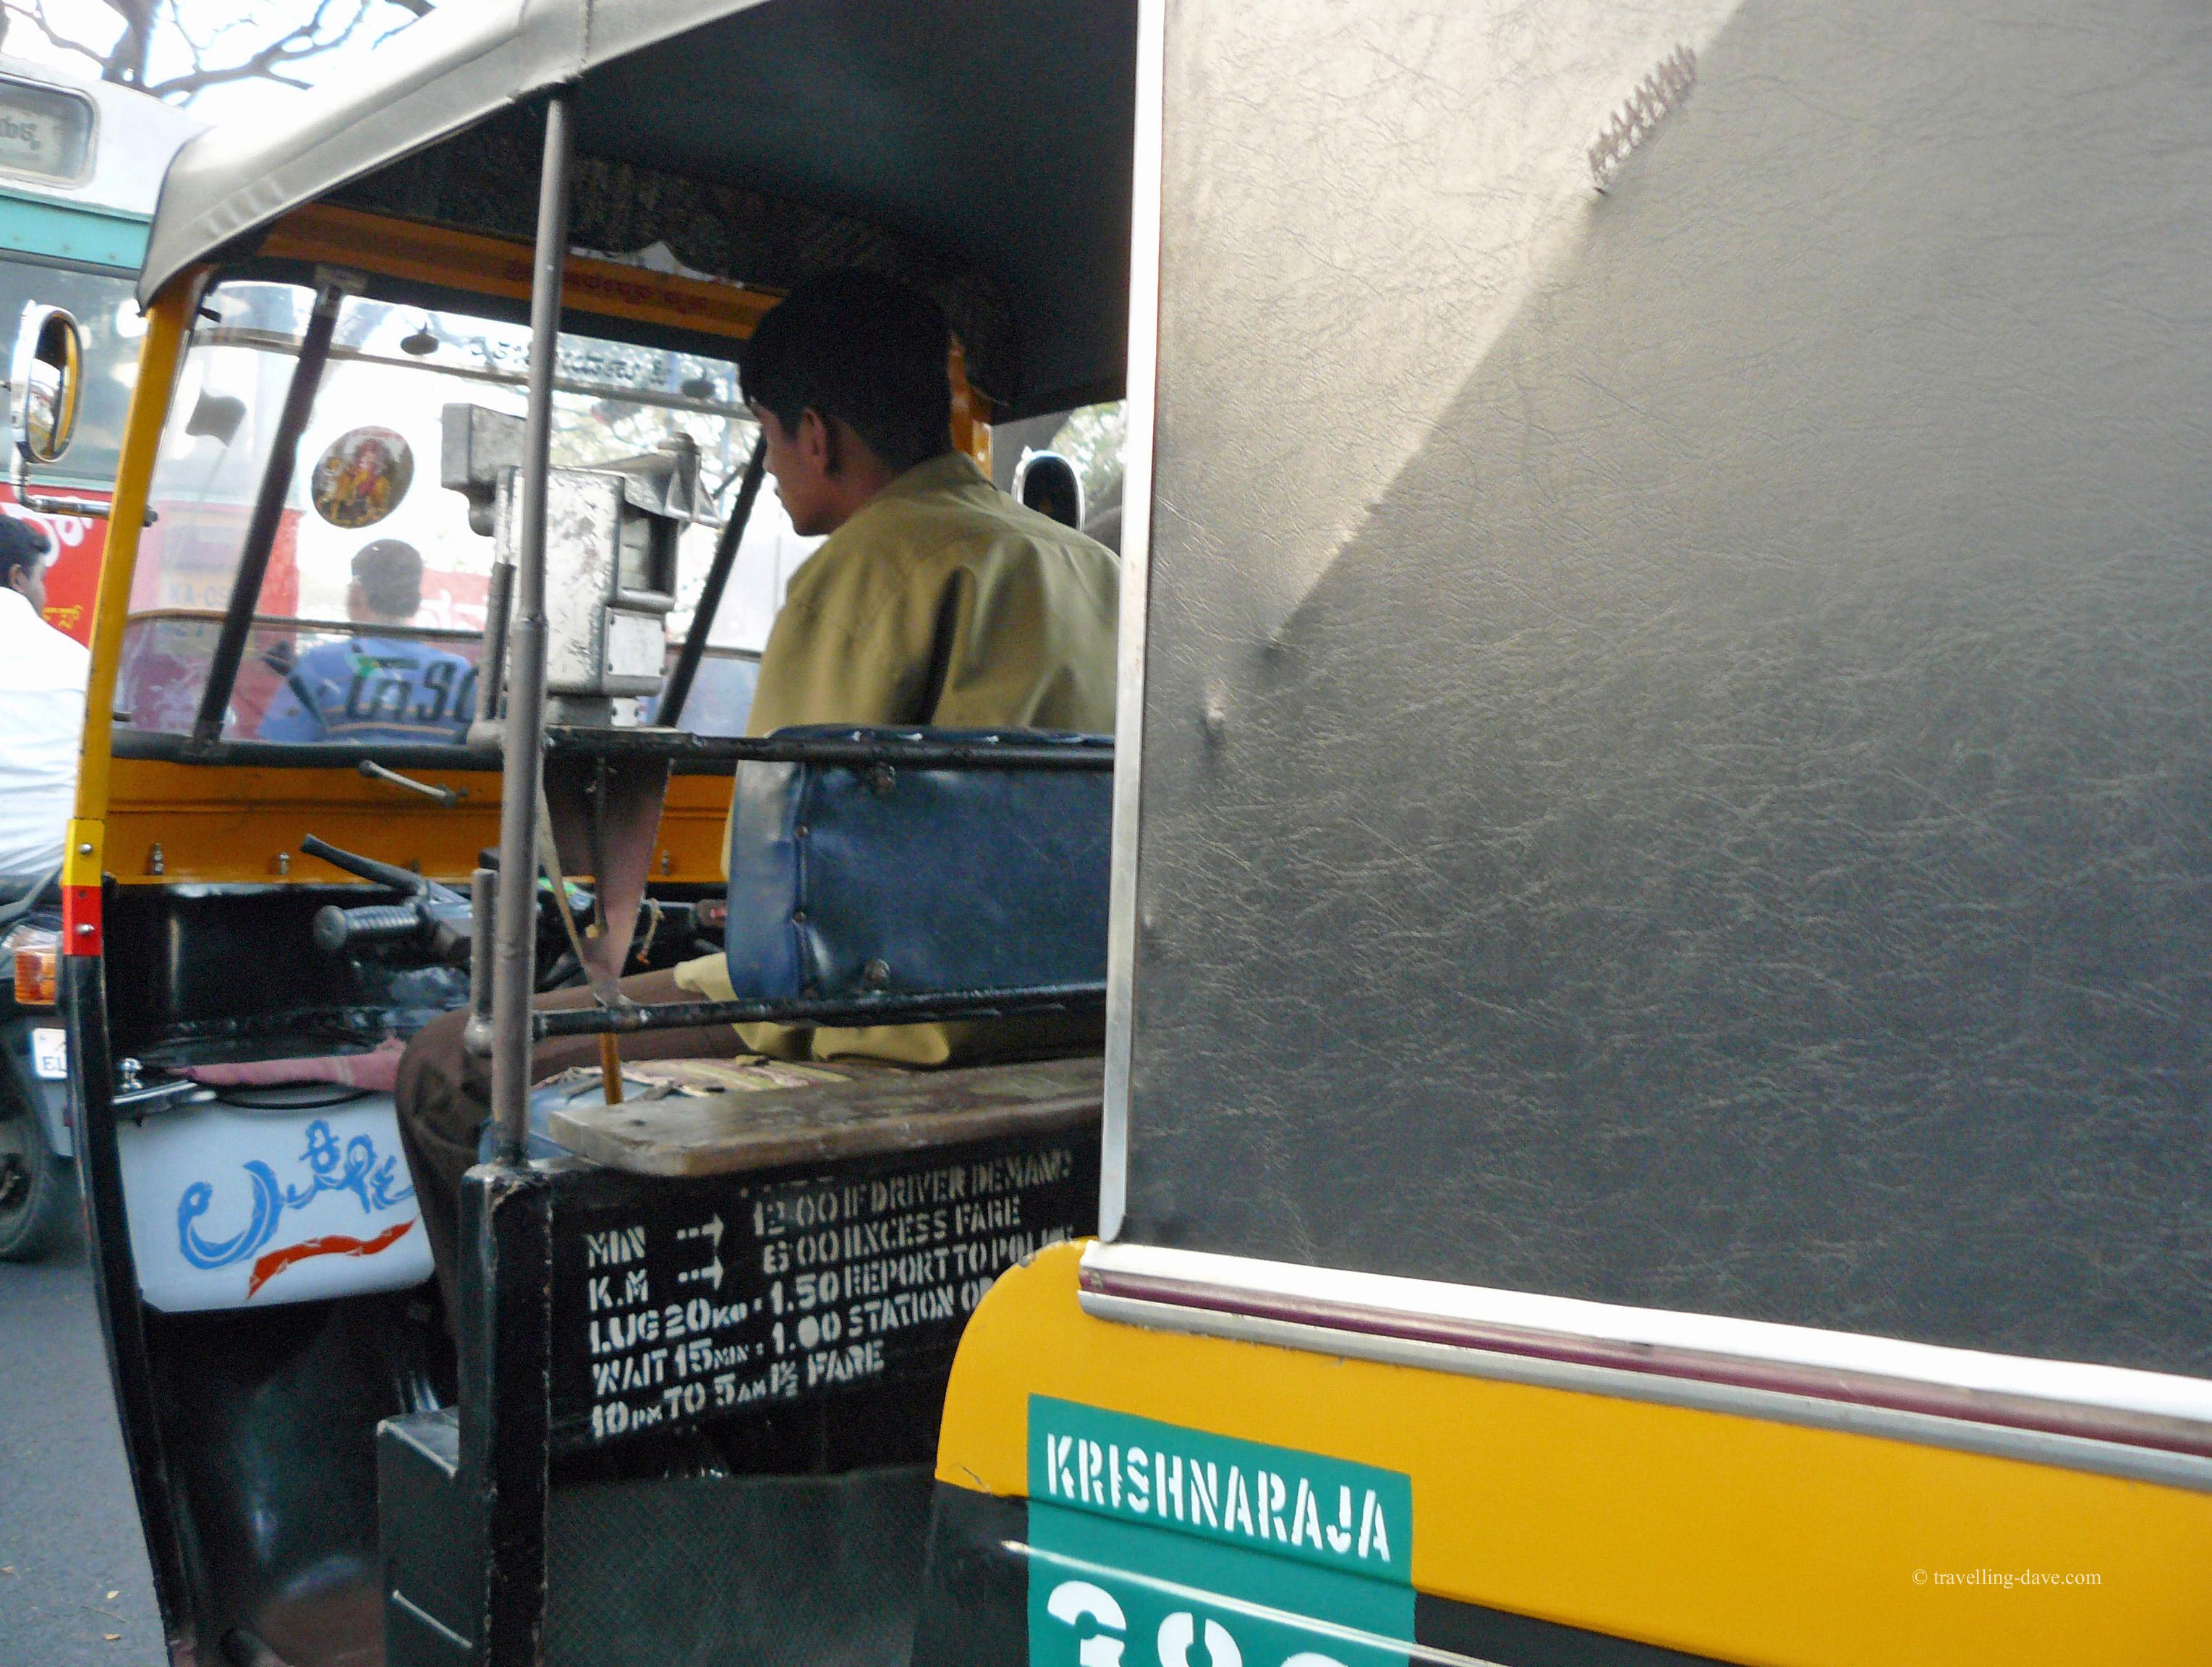 One of Mumbai's many auto rickshaws